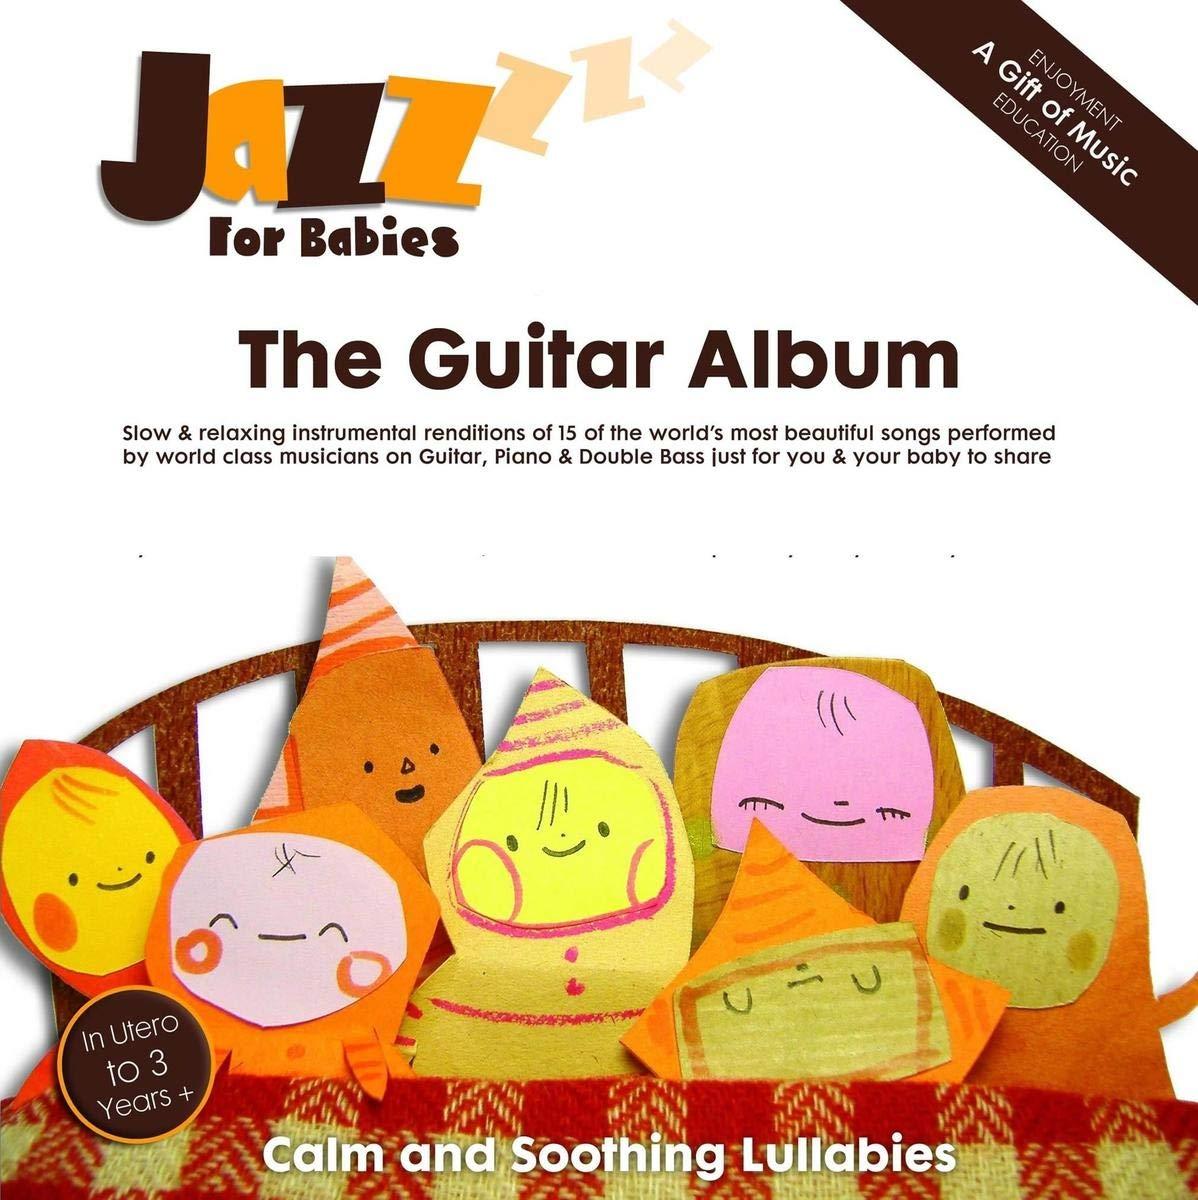 JAZZ FOR BABIES: THE GUITAR ALBUM: Michael Janisch: Amazon.es: Música